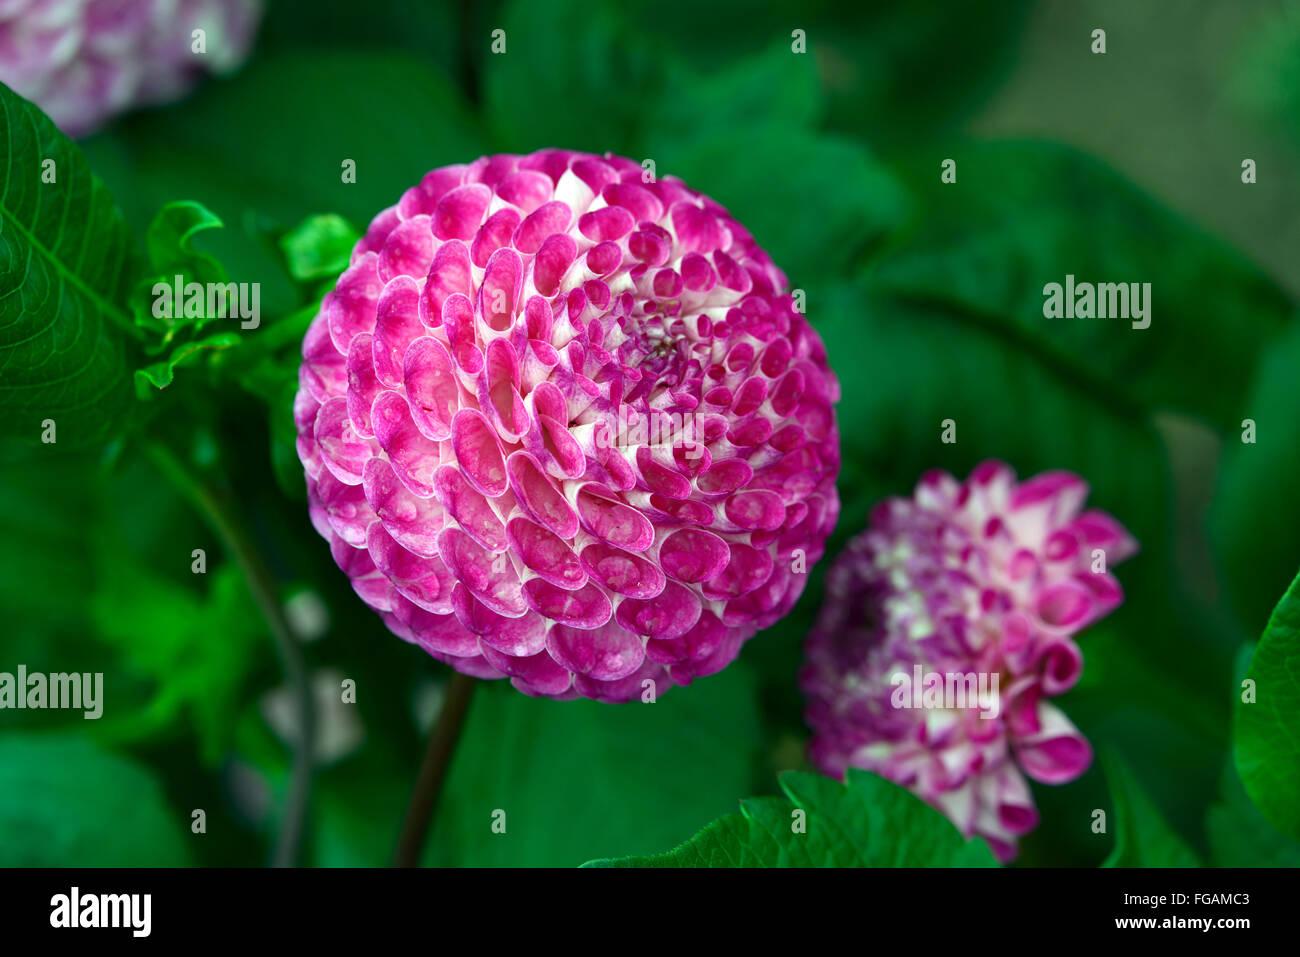 dahlia megan corrigan kearns pompom pink dahlias flower flowers bloom blossom perennial tuber tuberous plant RM - Stock Image